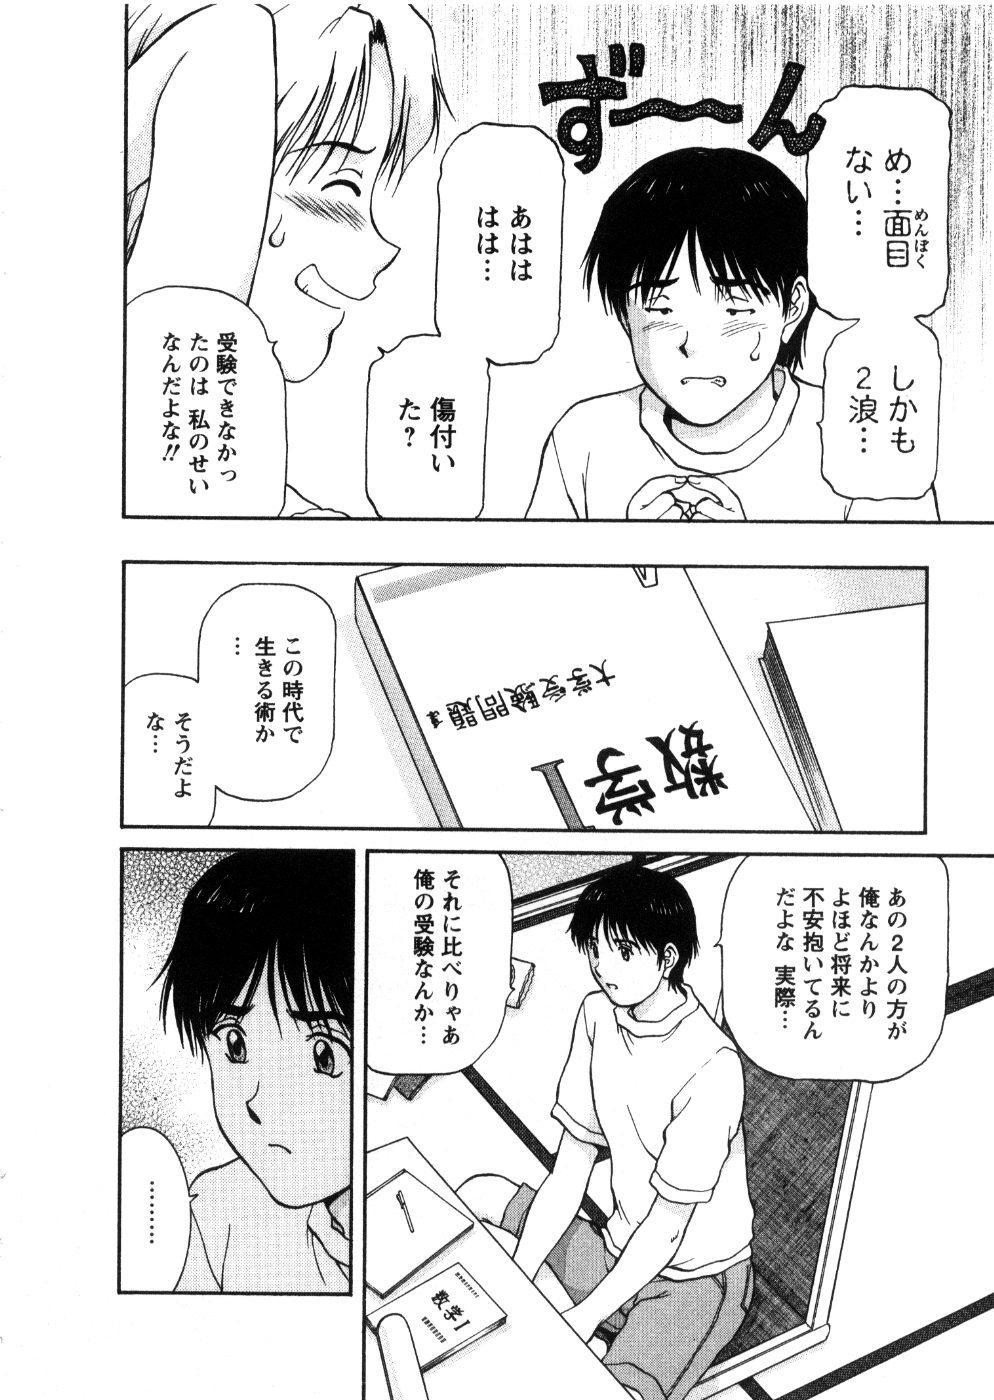 Oneechan-tachi ga Yatte Kuru 03 73